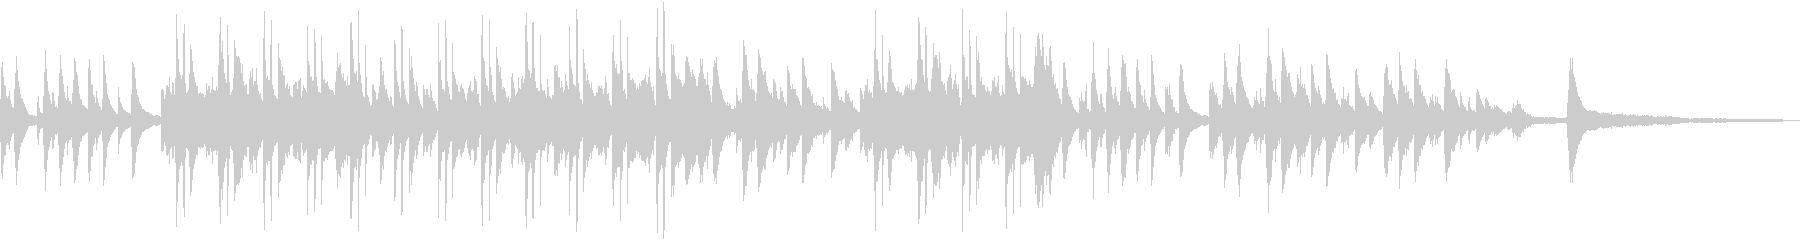 Piano/Clarinet/Guit…の未再生の波形